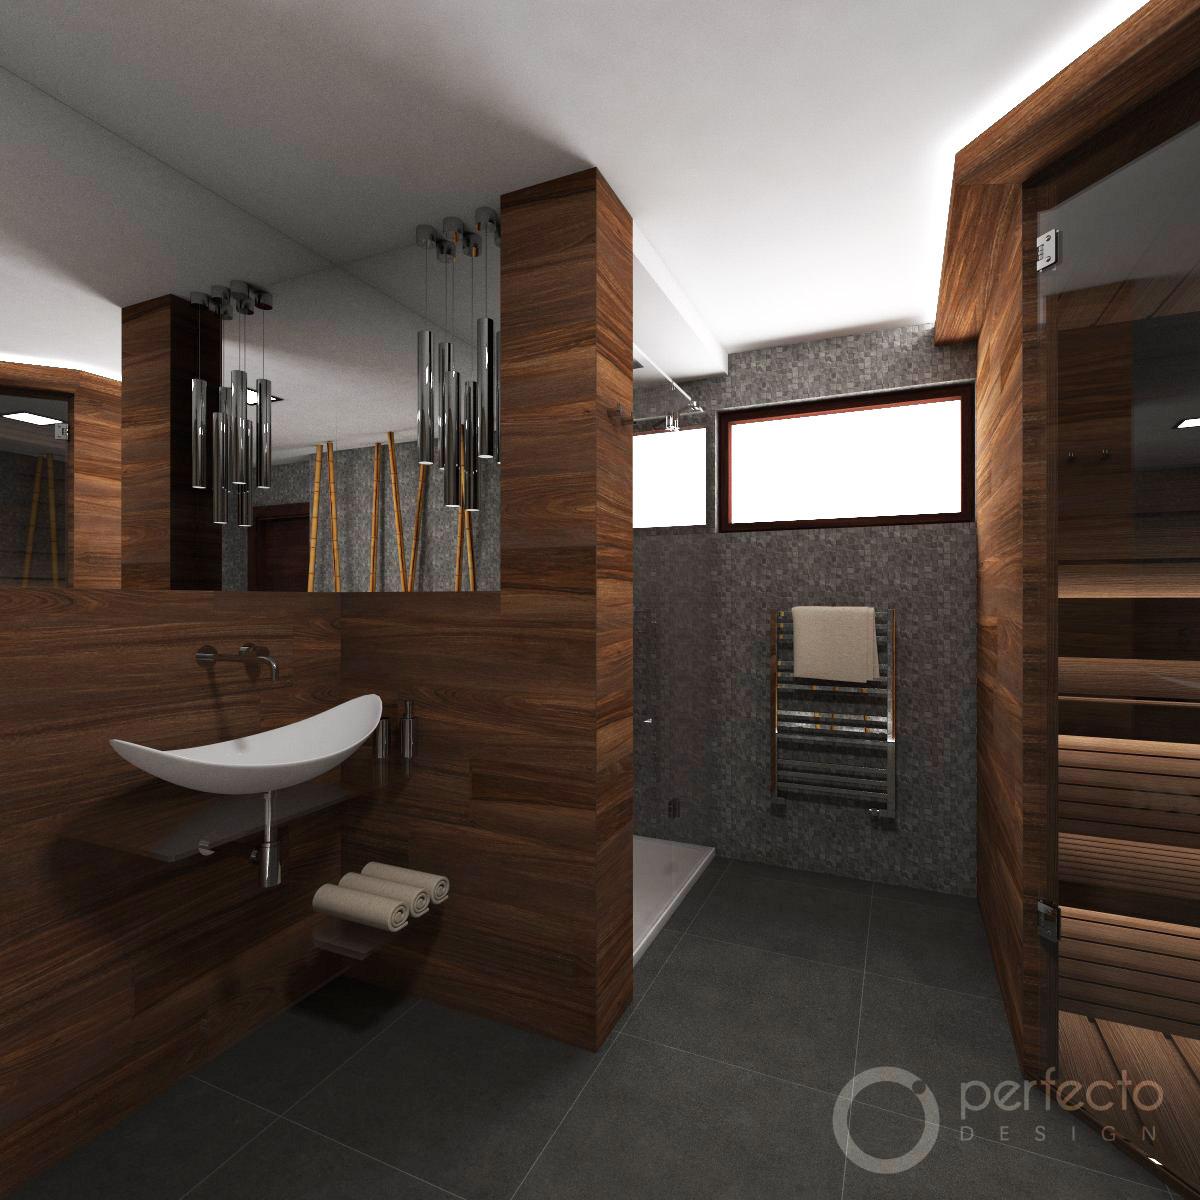 modernes wellness badezimmer zen | perfecto design